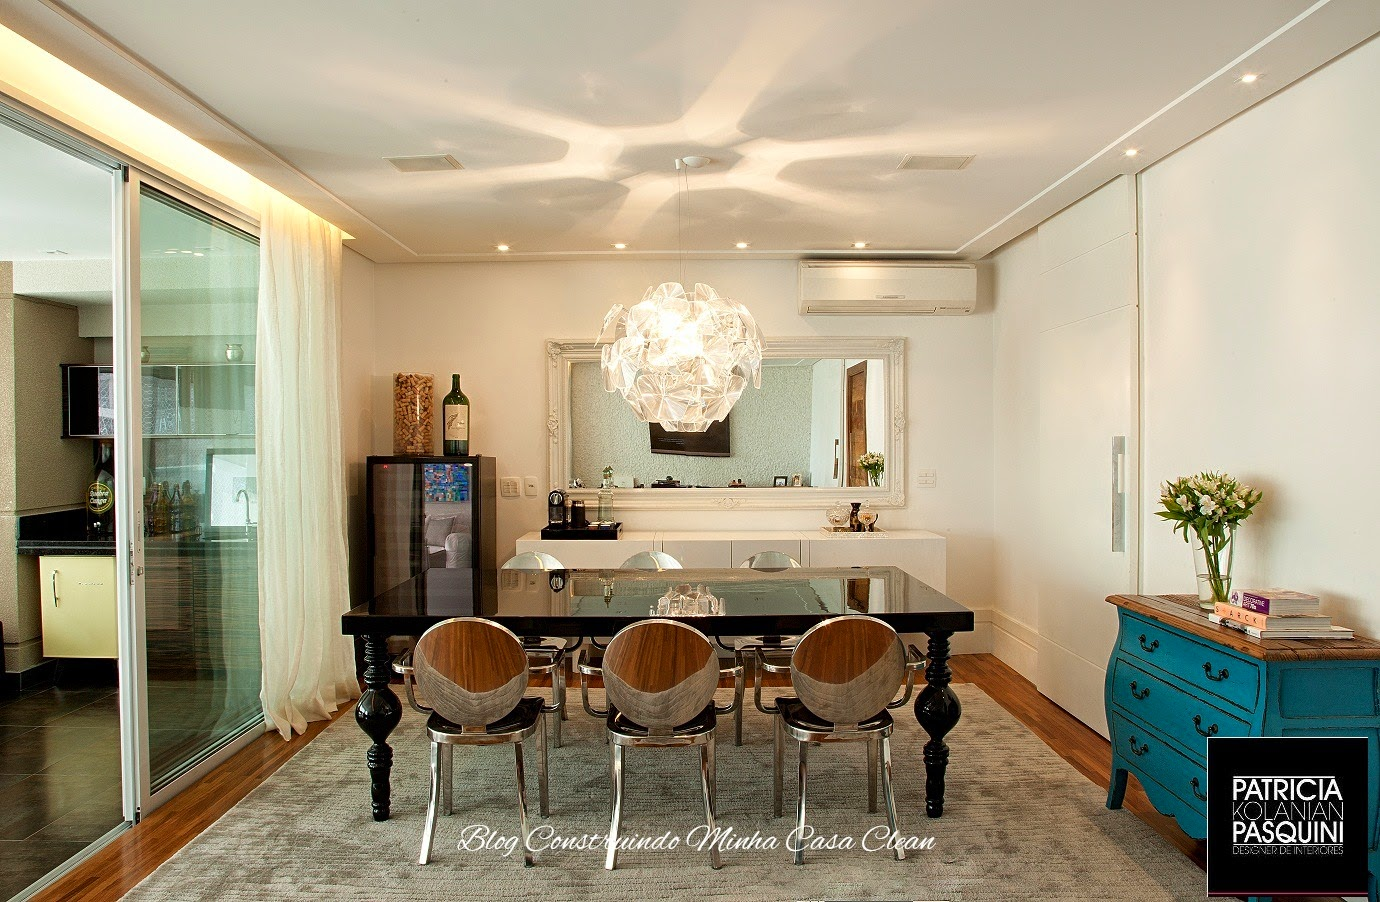 Como Usar Lustre Na Sala De Estar ~  Minha Casa Clean Qual Lustre ou Pendente Usar na Sala de Jantar